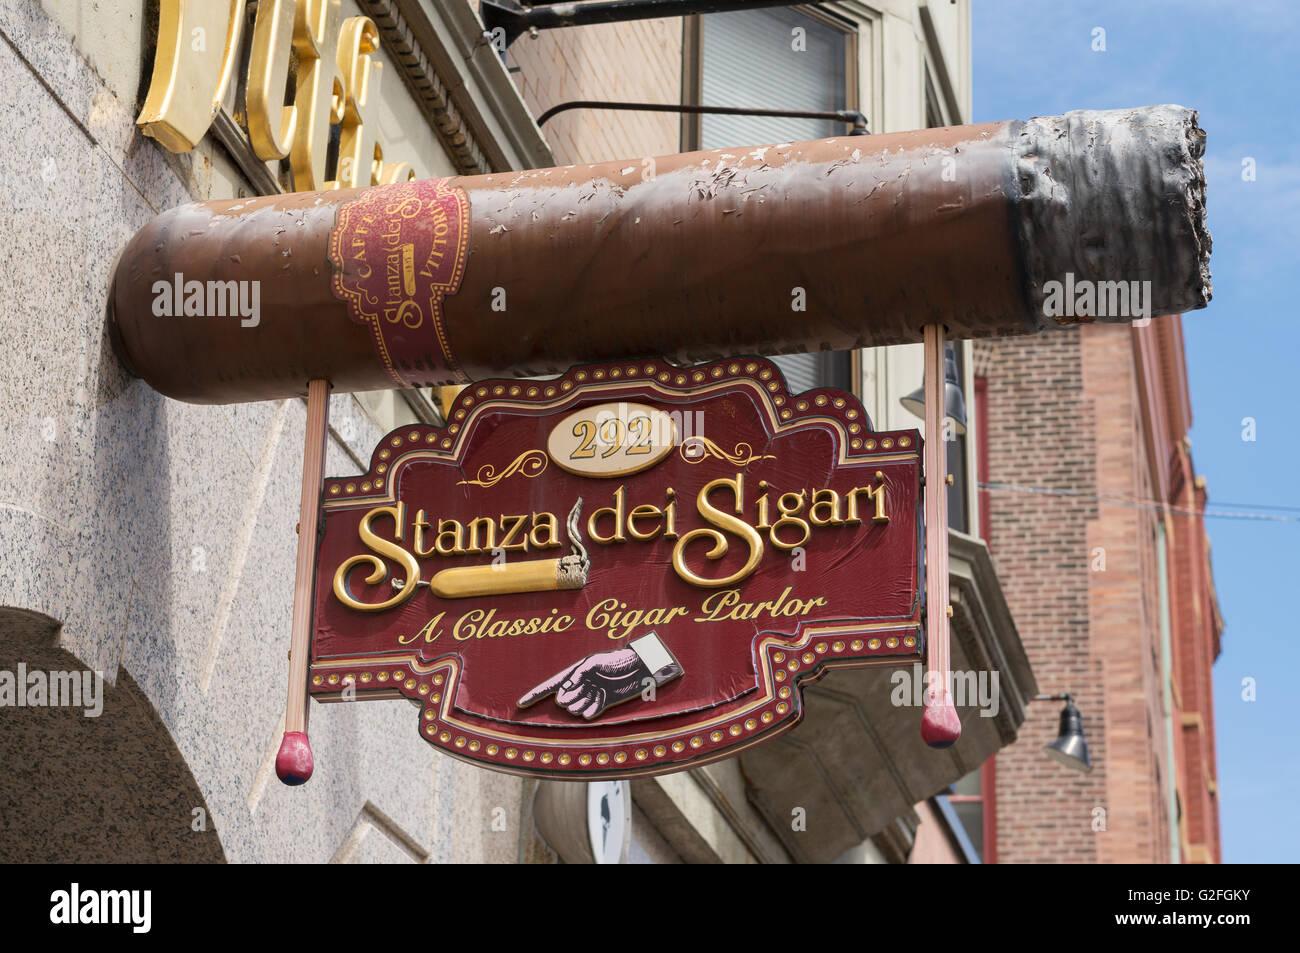 Stanza Dei Sigari History : Sigari stockfotos & sigari bilder alamy